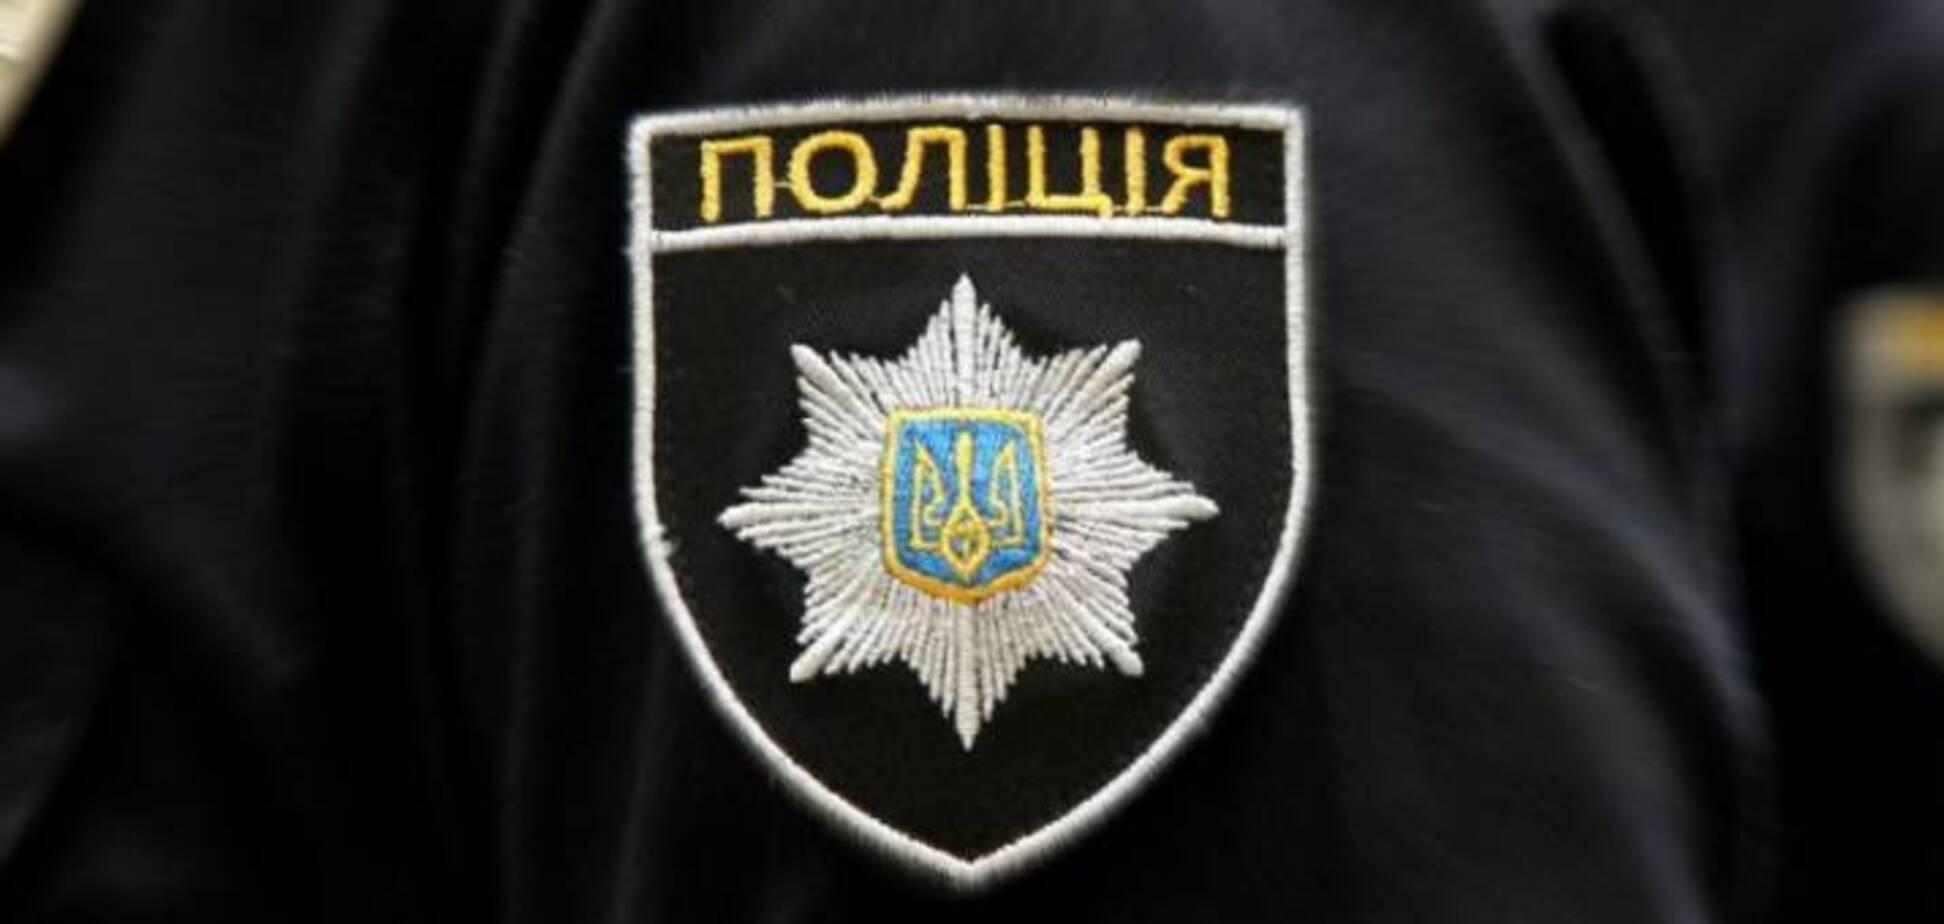 4 года не на связи: полиция разыскивает пропавшую эмигрантку из Днепра. Фото